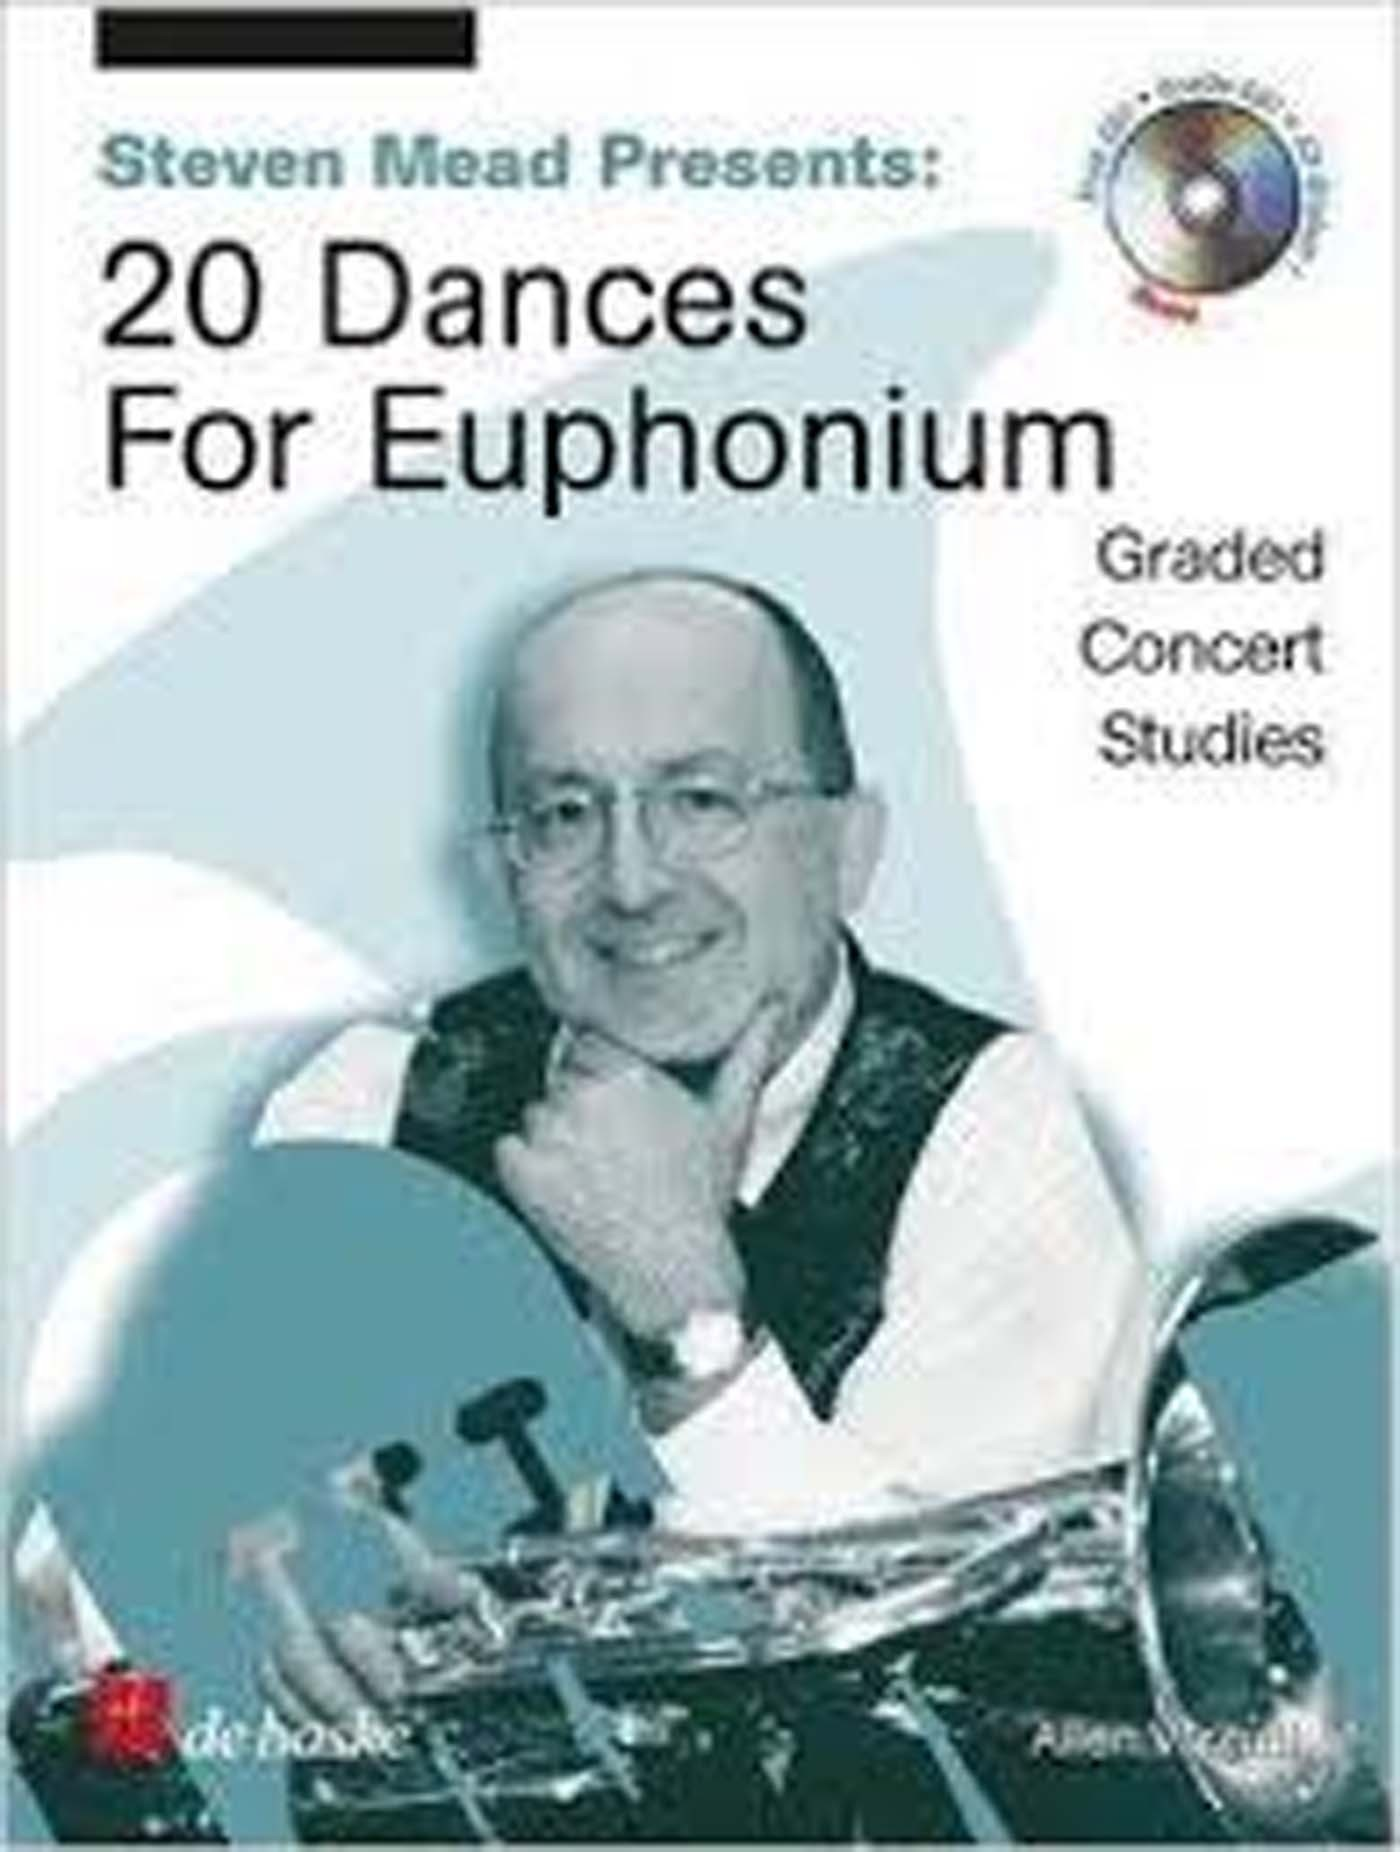 Steven Mead 20 Dances For Euphonium Baritone Graded Studies Book & CD S162